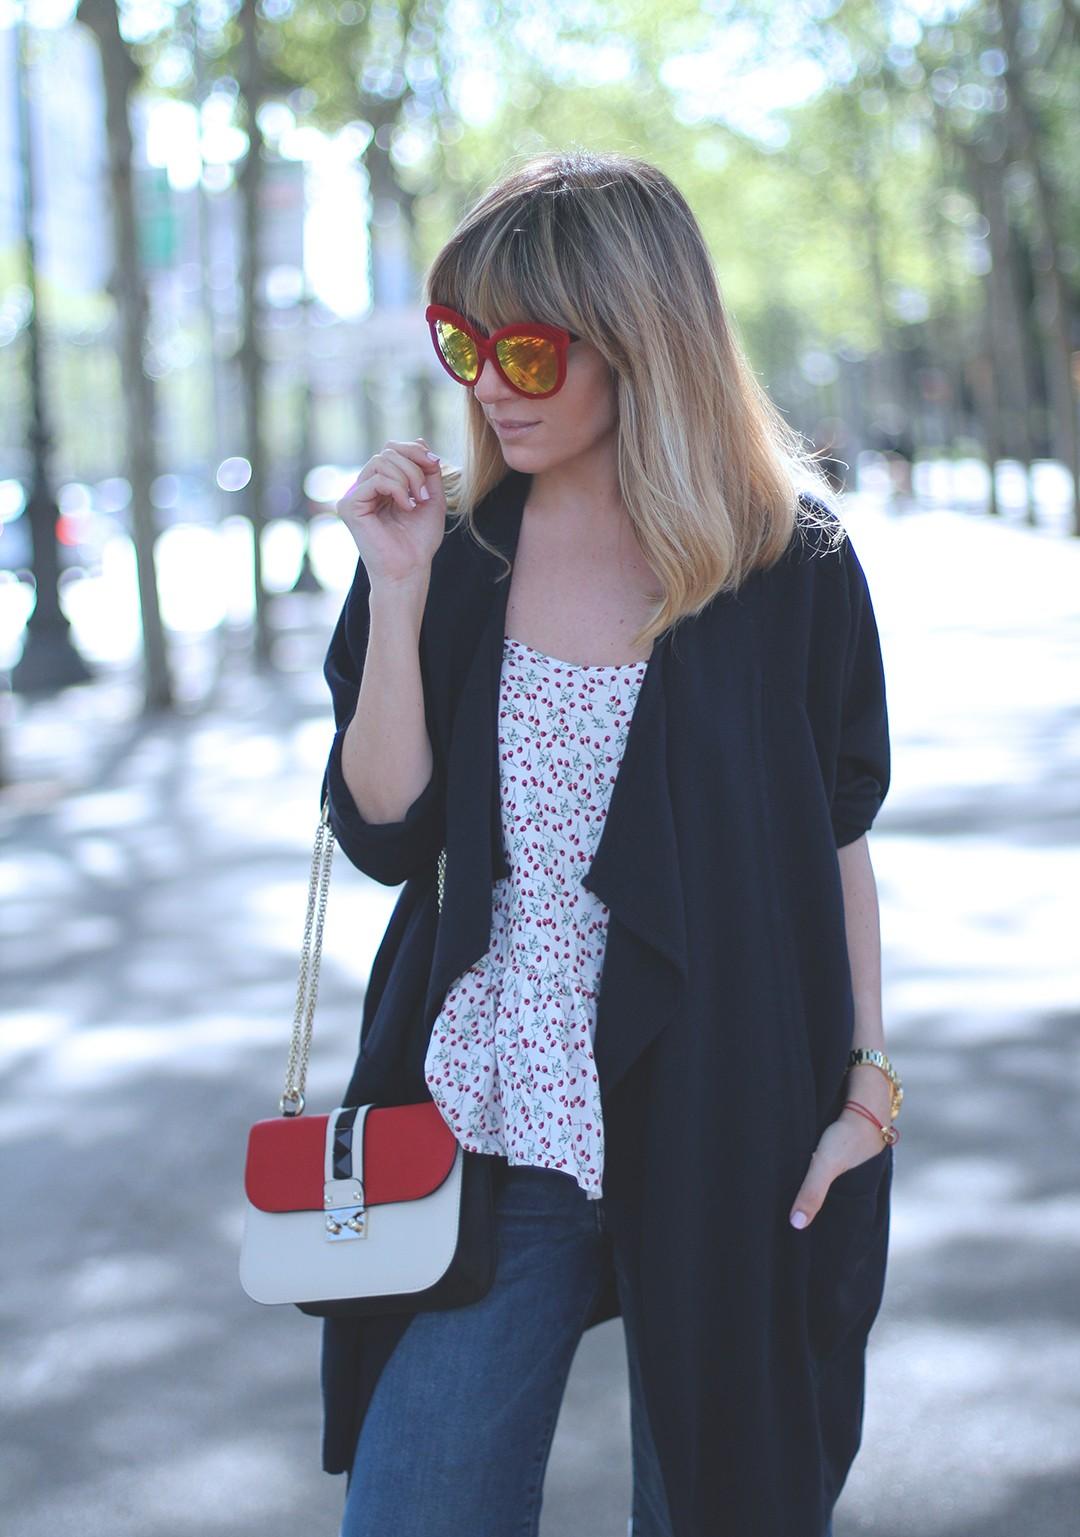 Barcelona-Fashion-Blogger-Monica-Sors-outfits